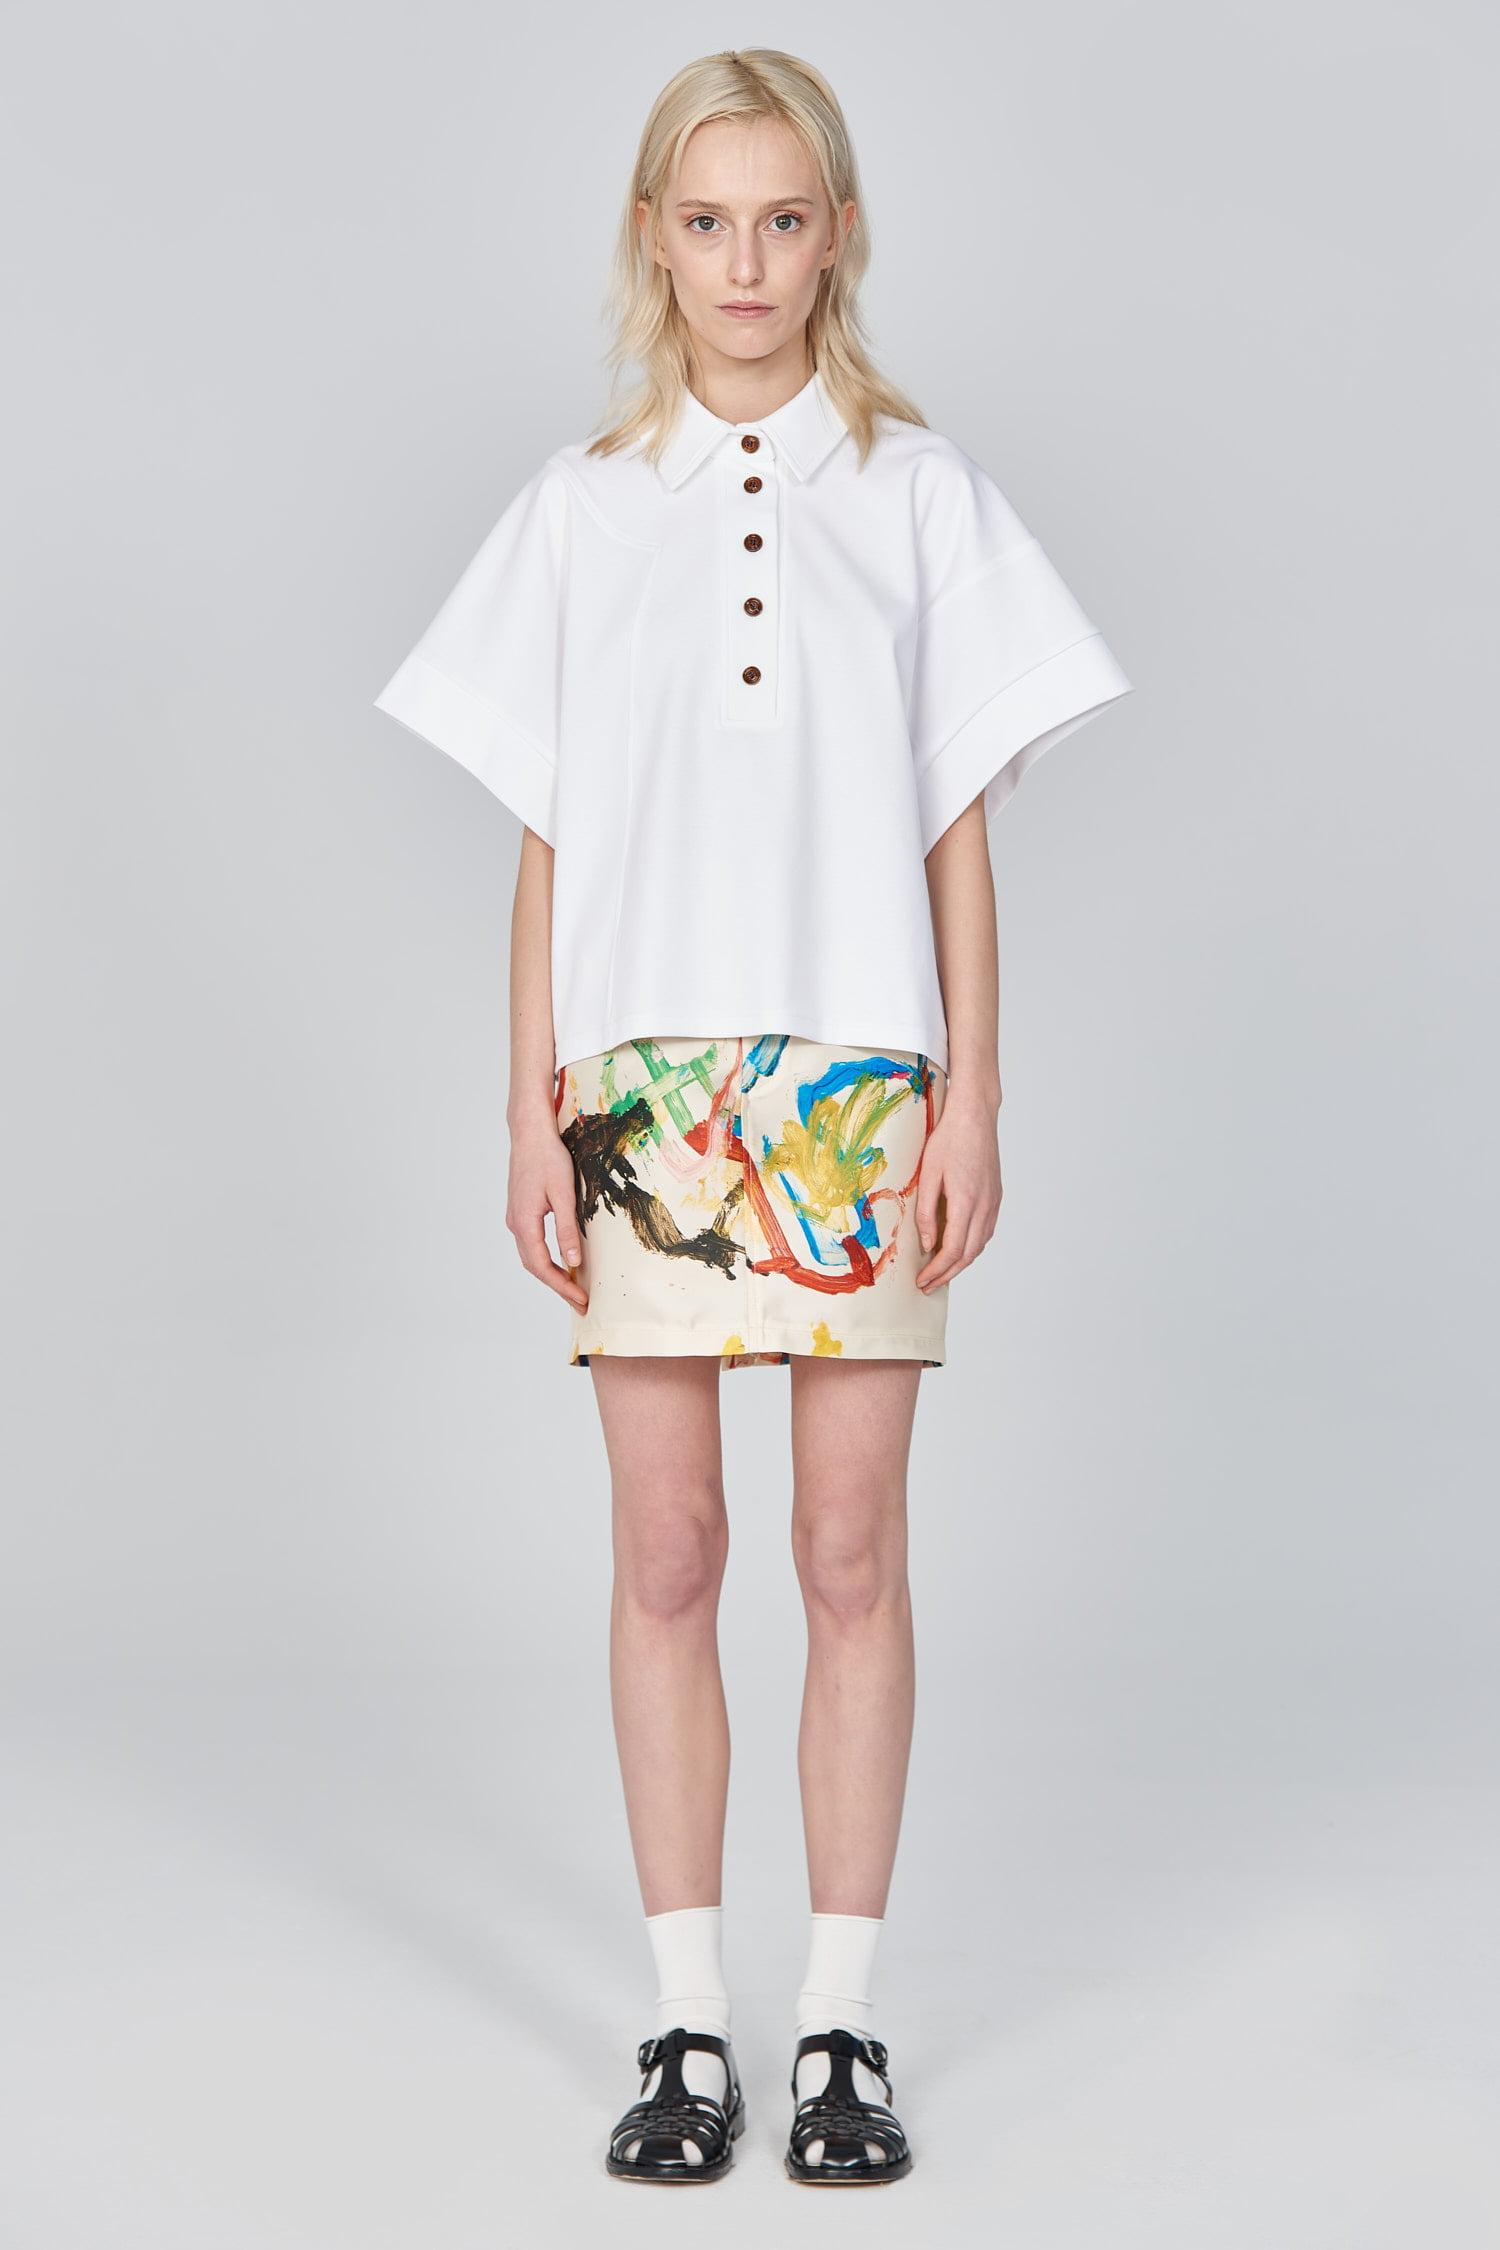 Acephala Ss21 White Polo Shirt Front